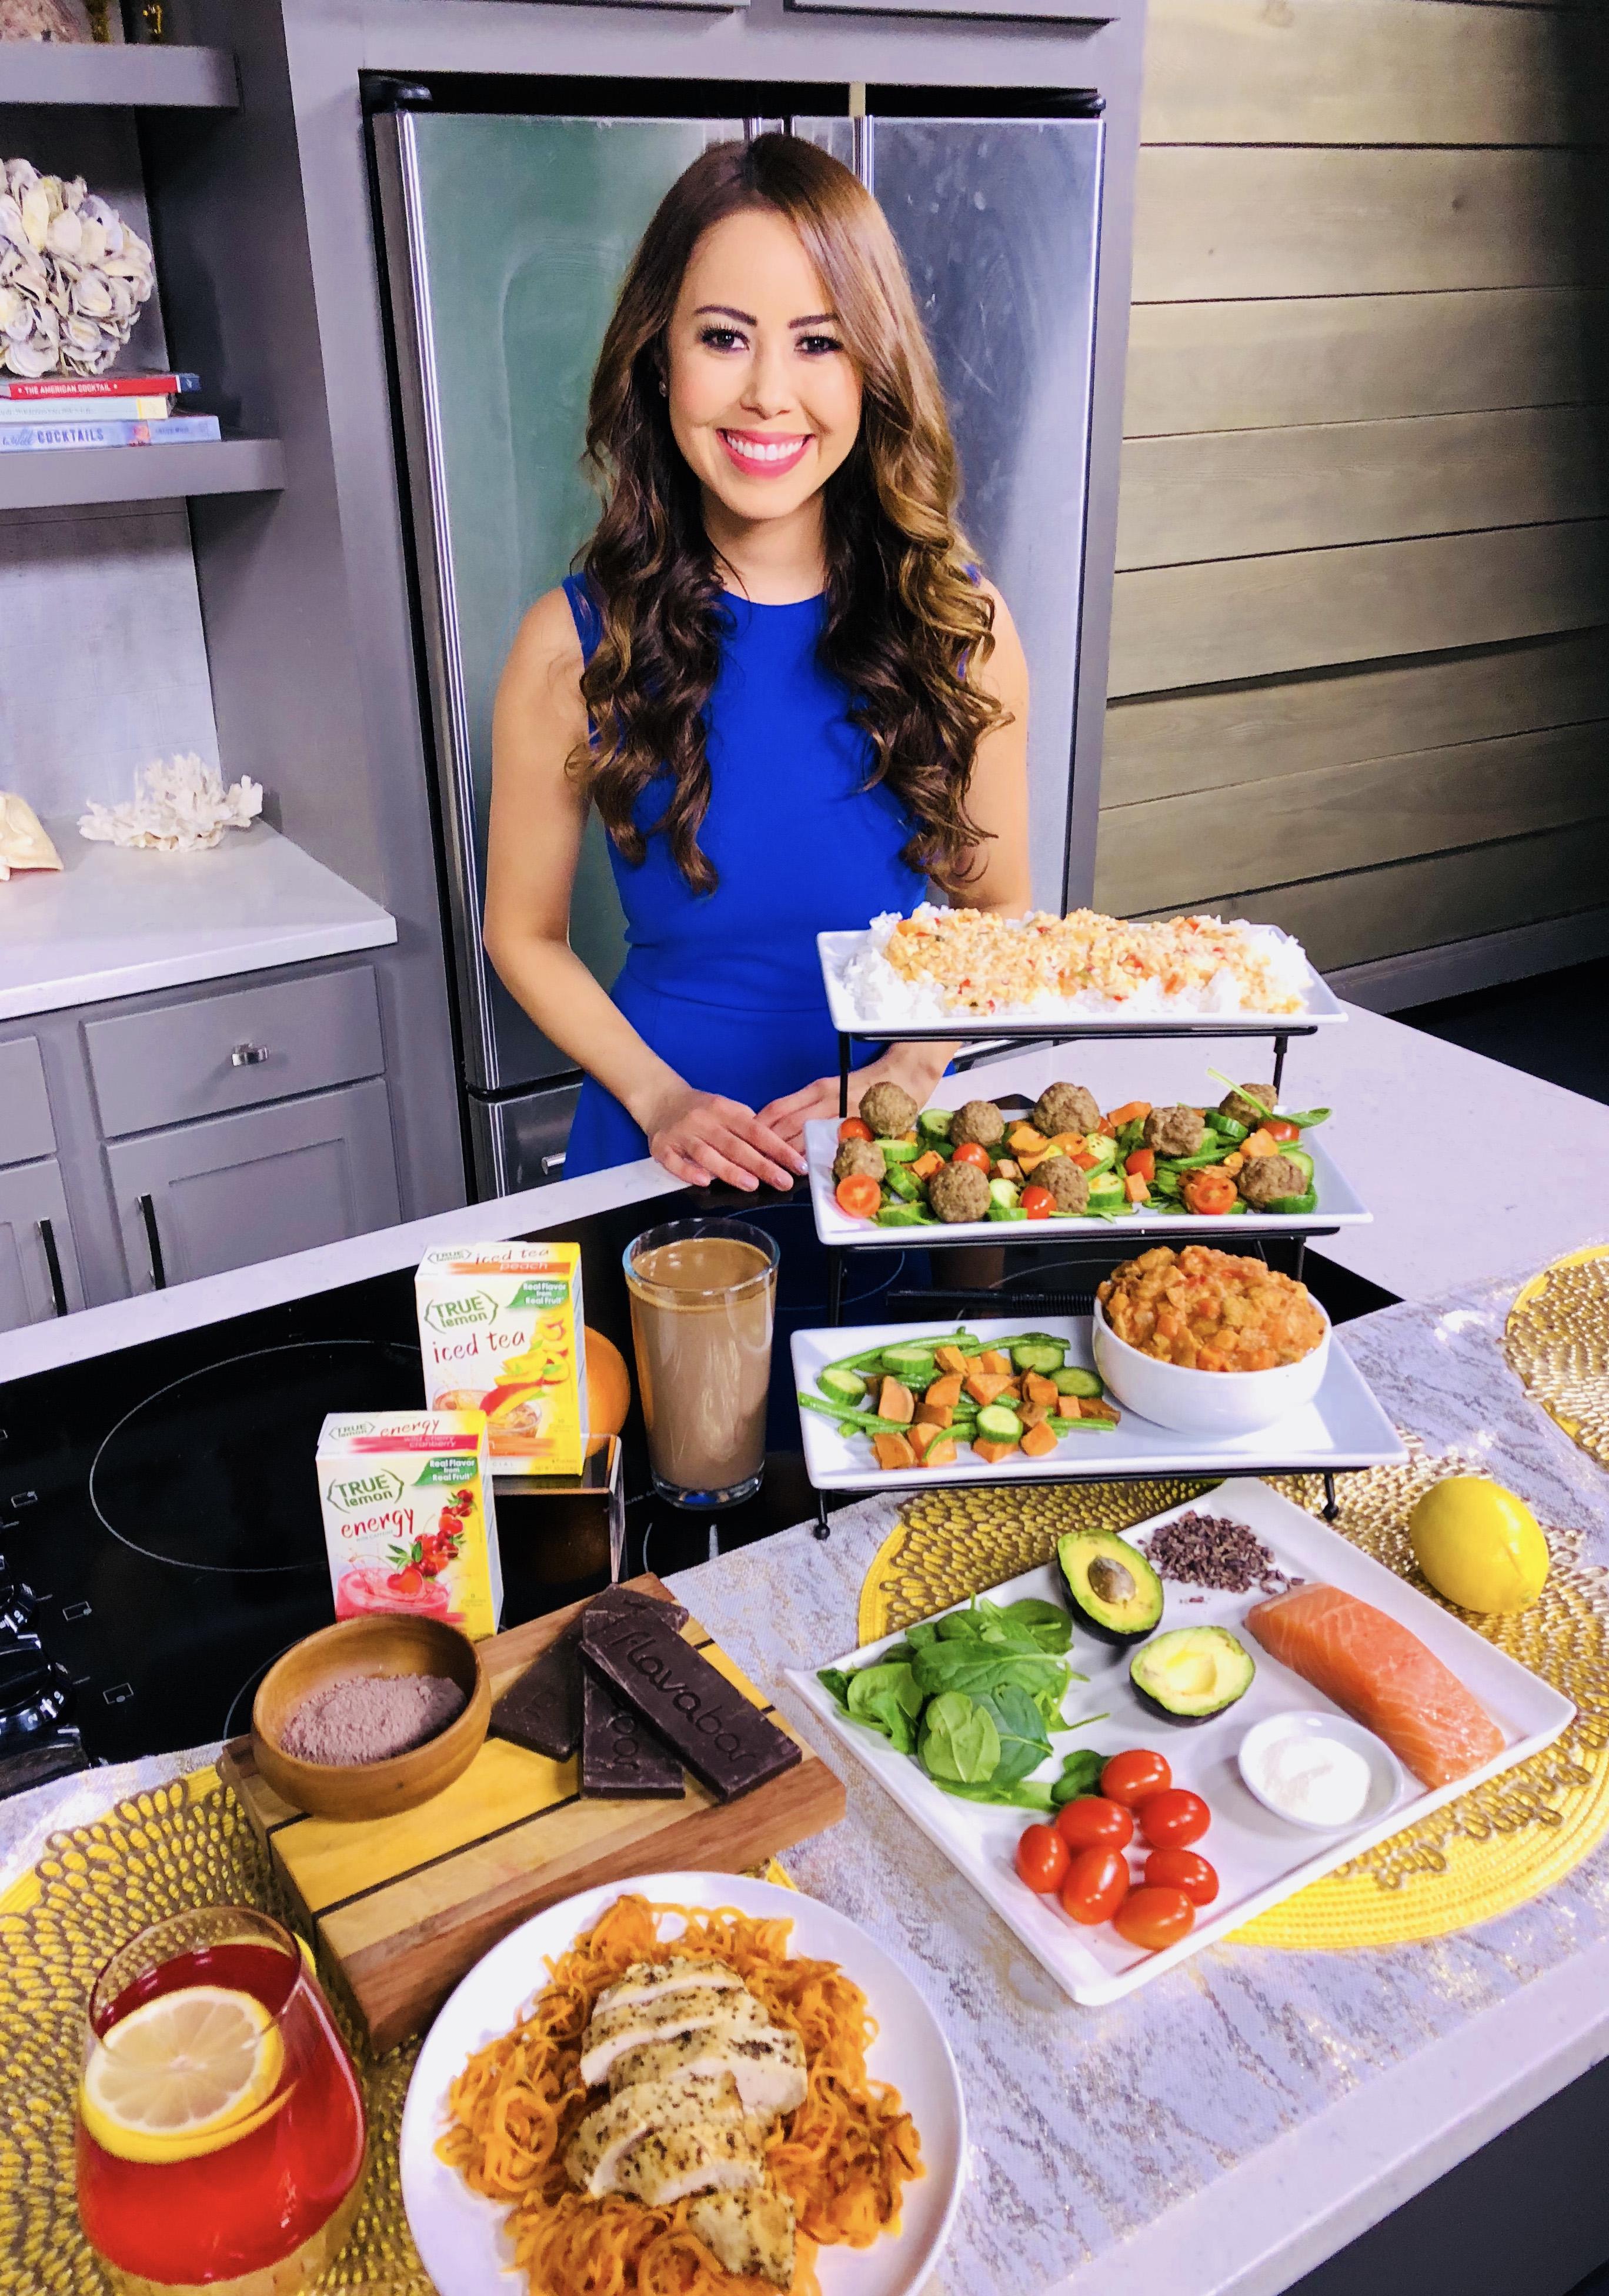 TV Dietitian Nutritionist Mia Syn ABC True Lemon, Beetnik, Super Collagen Neocell, FlavaNaturals